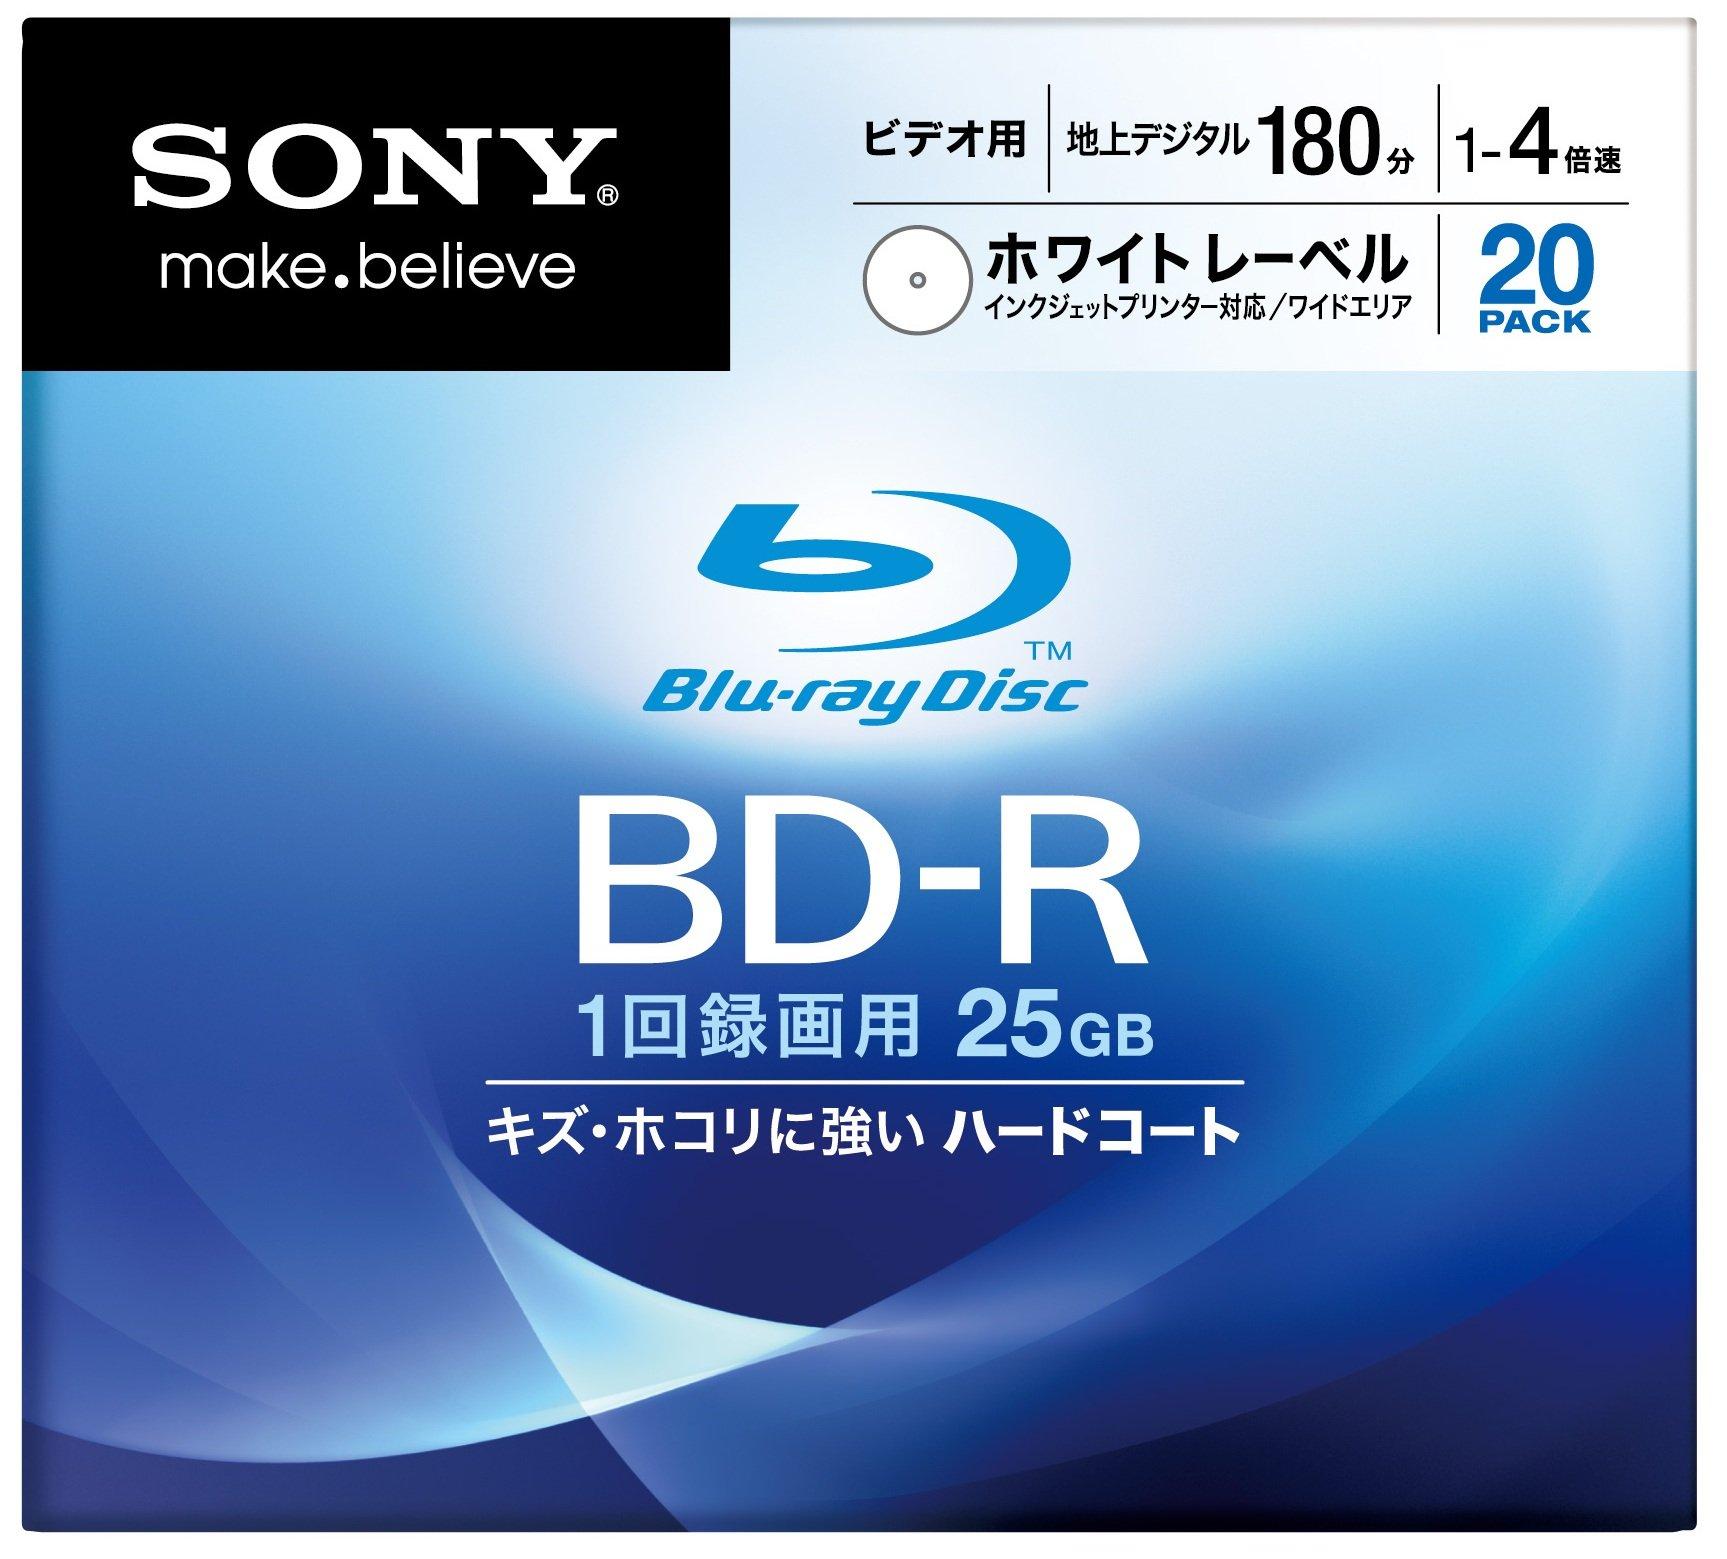 Sony Blu-ray Disc 20 Pack - 25GB 4X Speed BD-R - White Inkjet Printable [2010 Version]